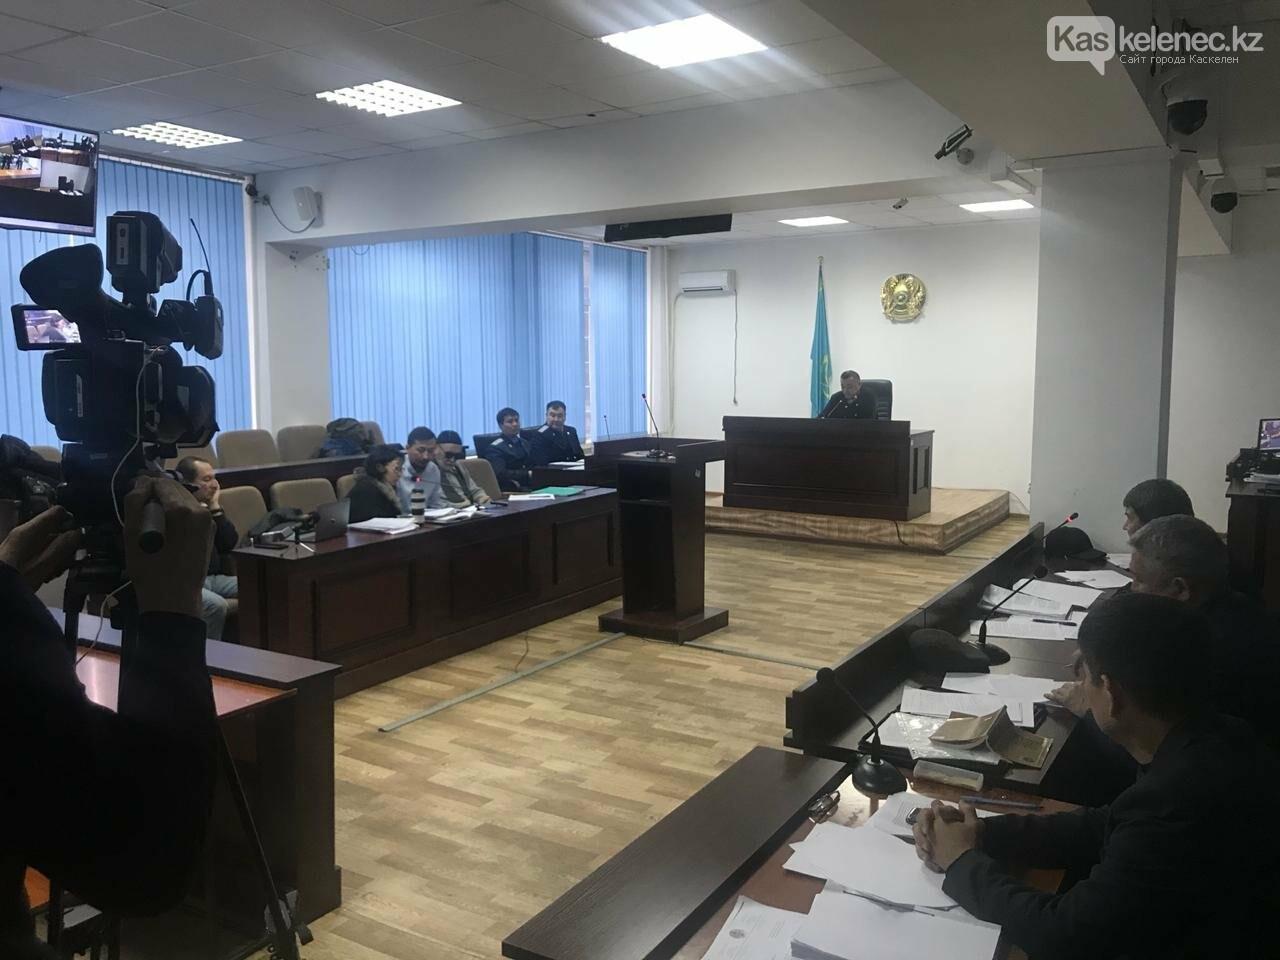 Убийство Дениса Тена: суд решил огласить приговор 17 января, фото-5